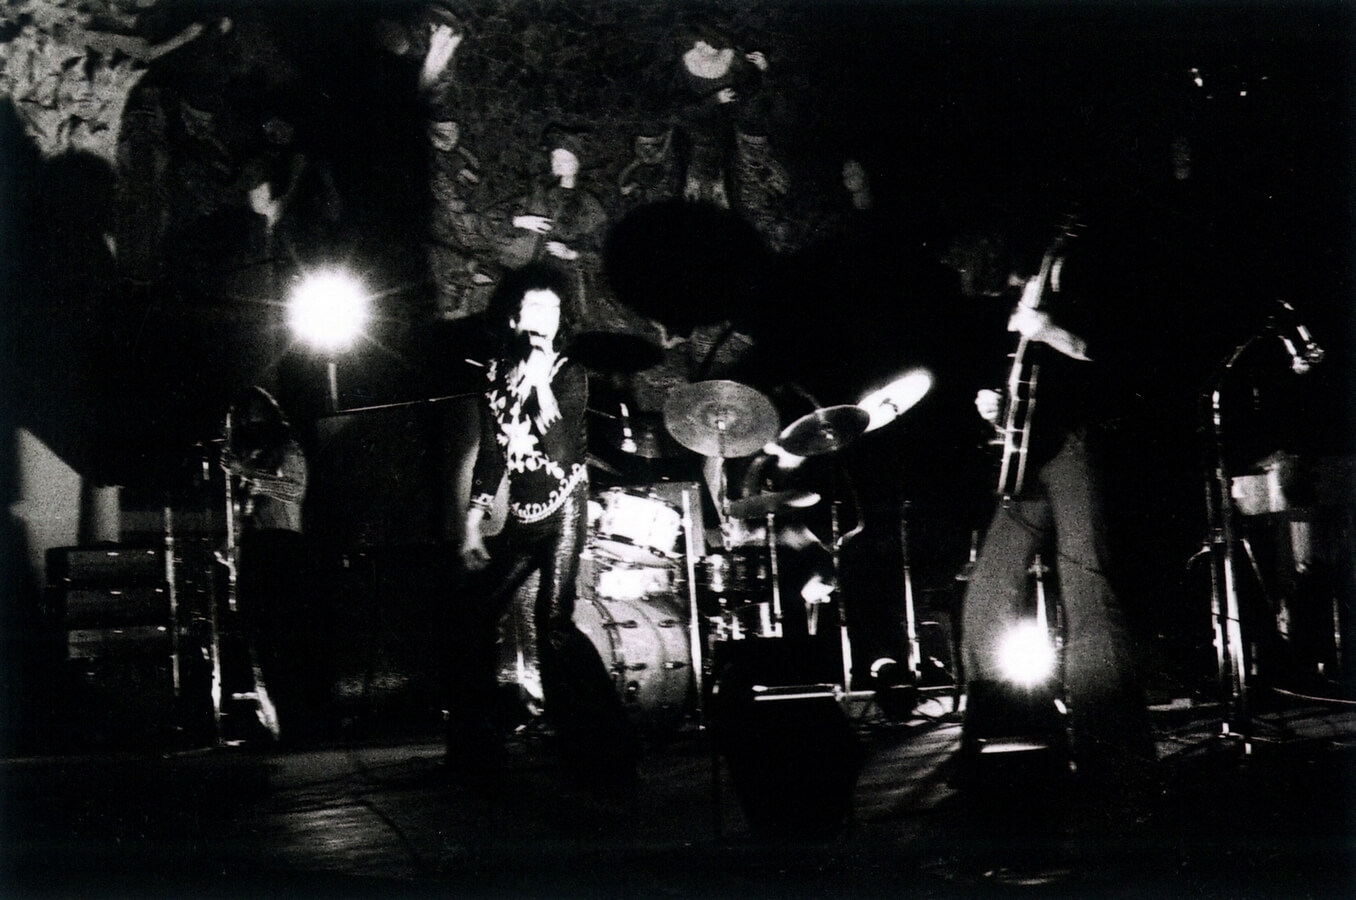 04-Palau-Musica-Lone-Star